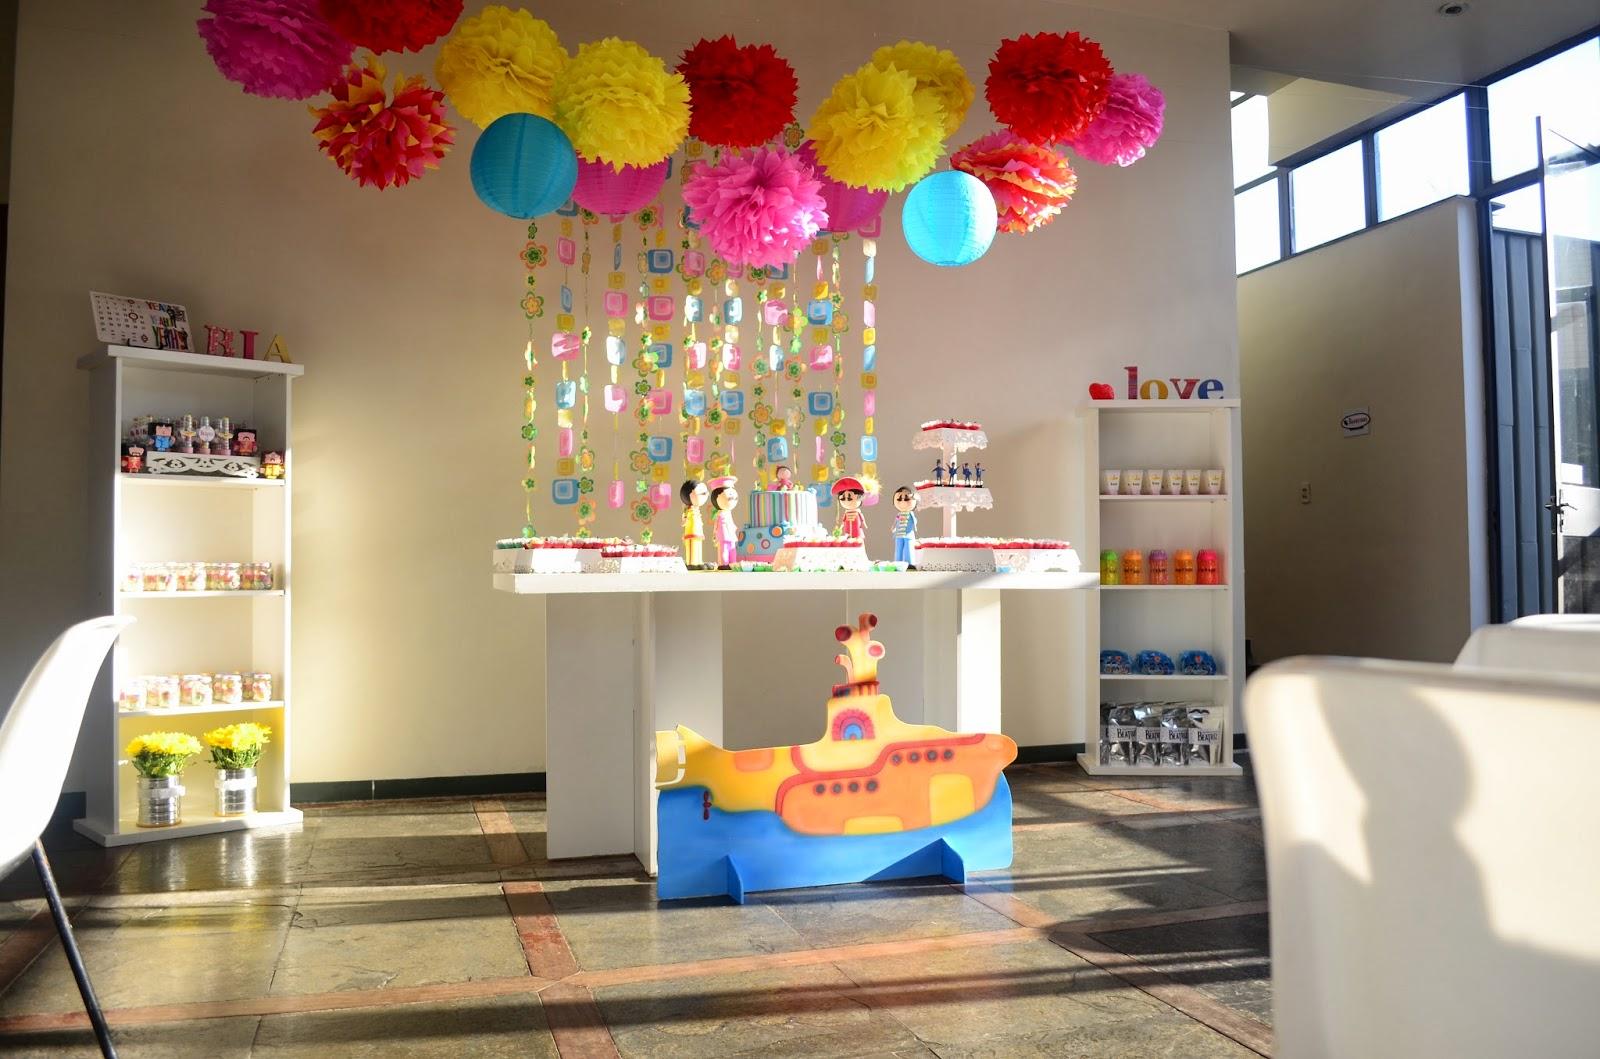 "decoracao festa infantil yellow submarine:Yellow submarine, yellow submarine"""